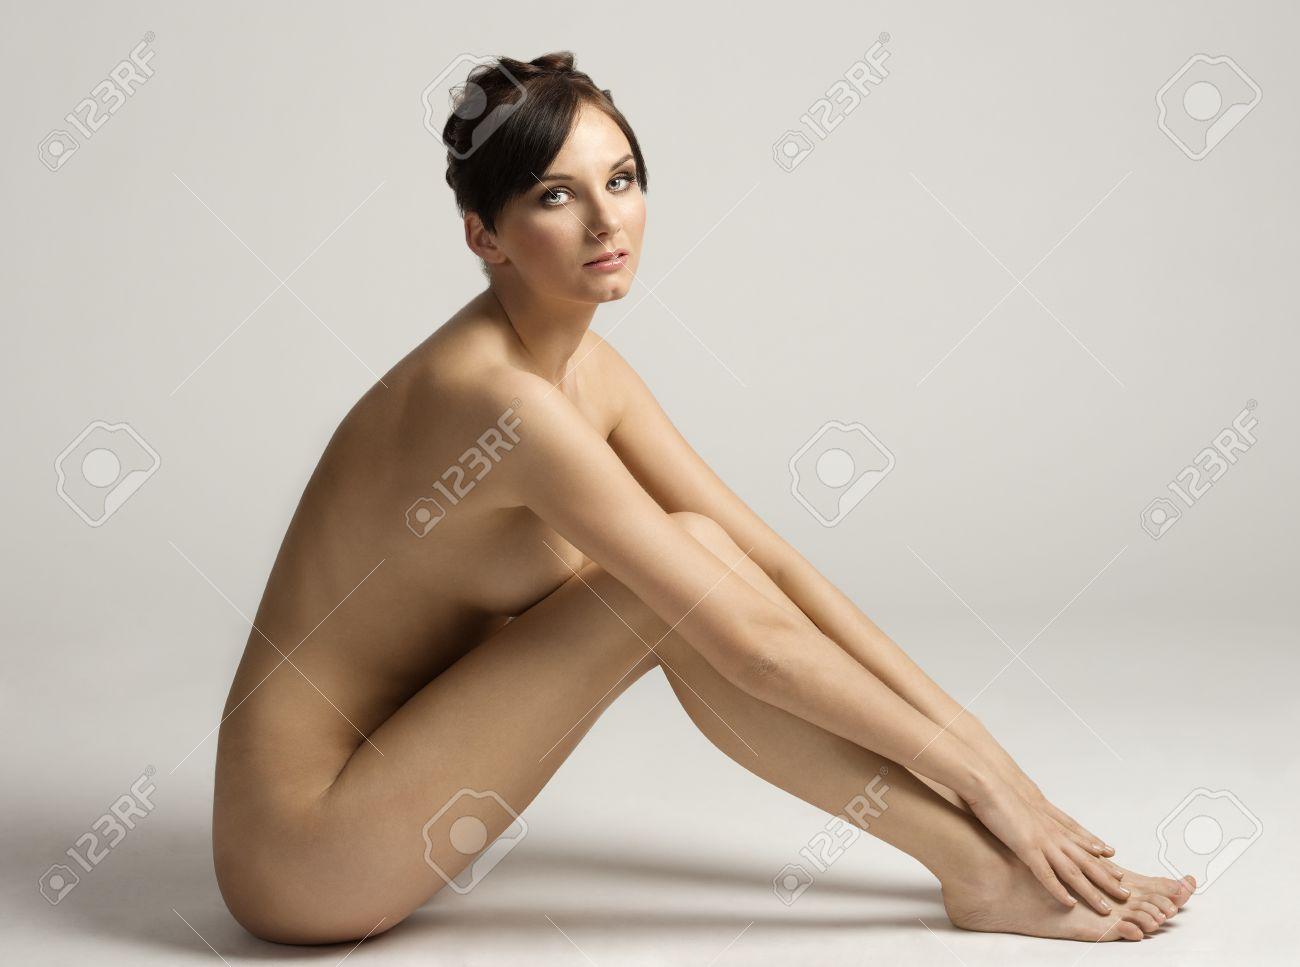 Italian sexy nude girls hd images